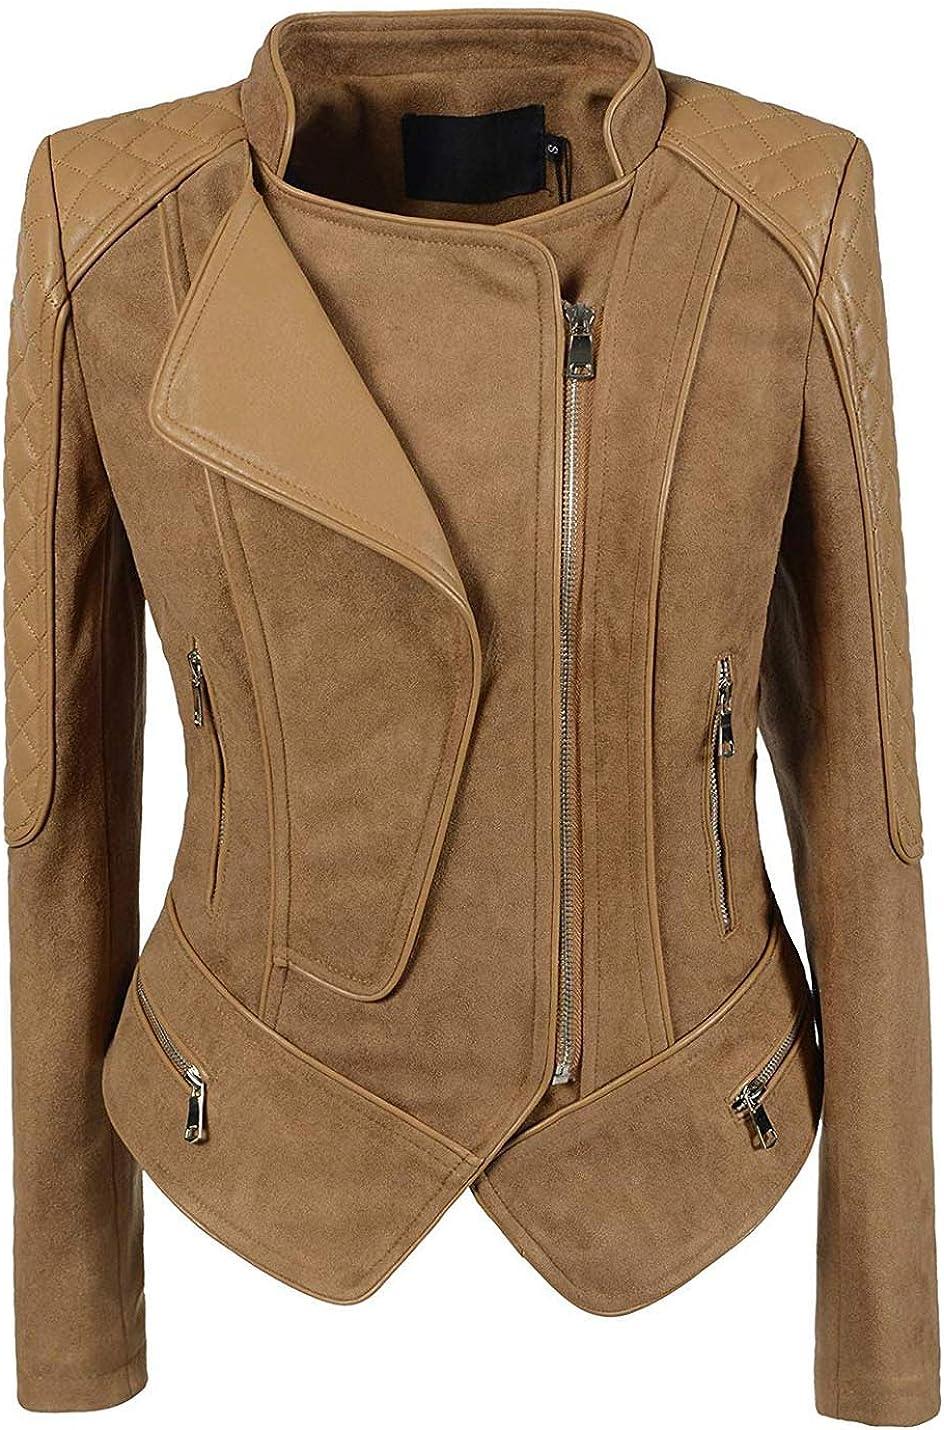 Arlita Women's Fashion Faux Suede-Pu Leather Quilted Biker Jacket Moto Biker Short Coat Jacket